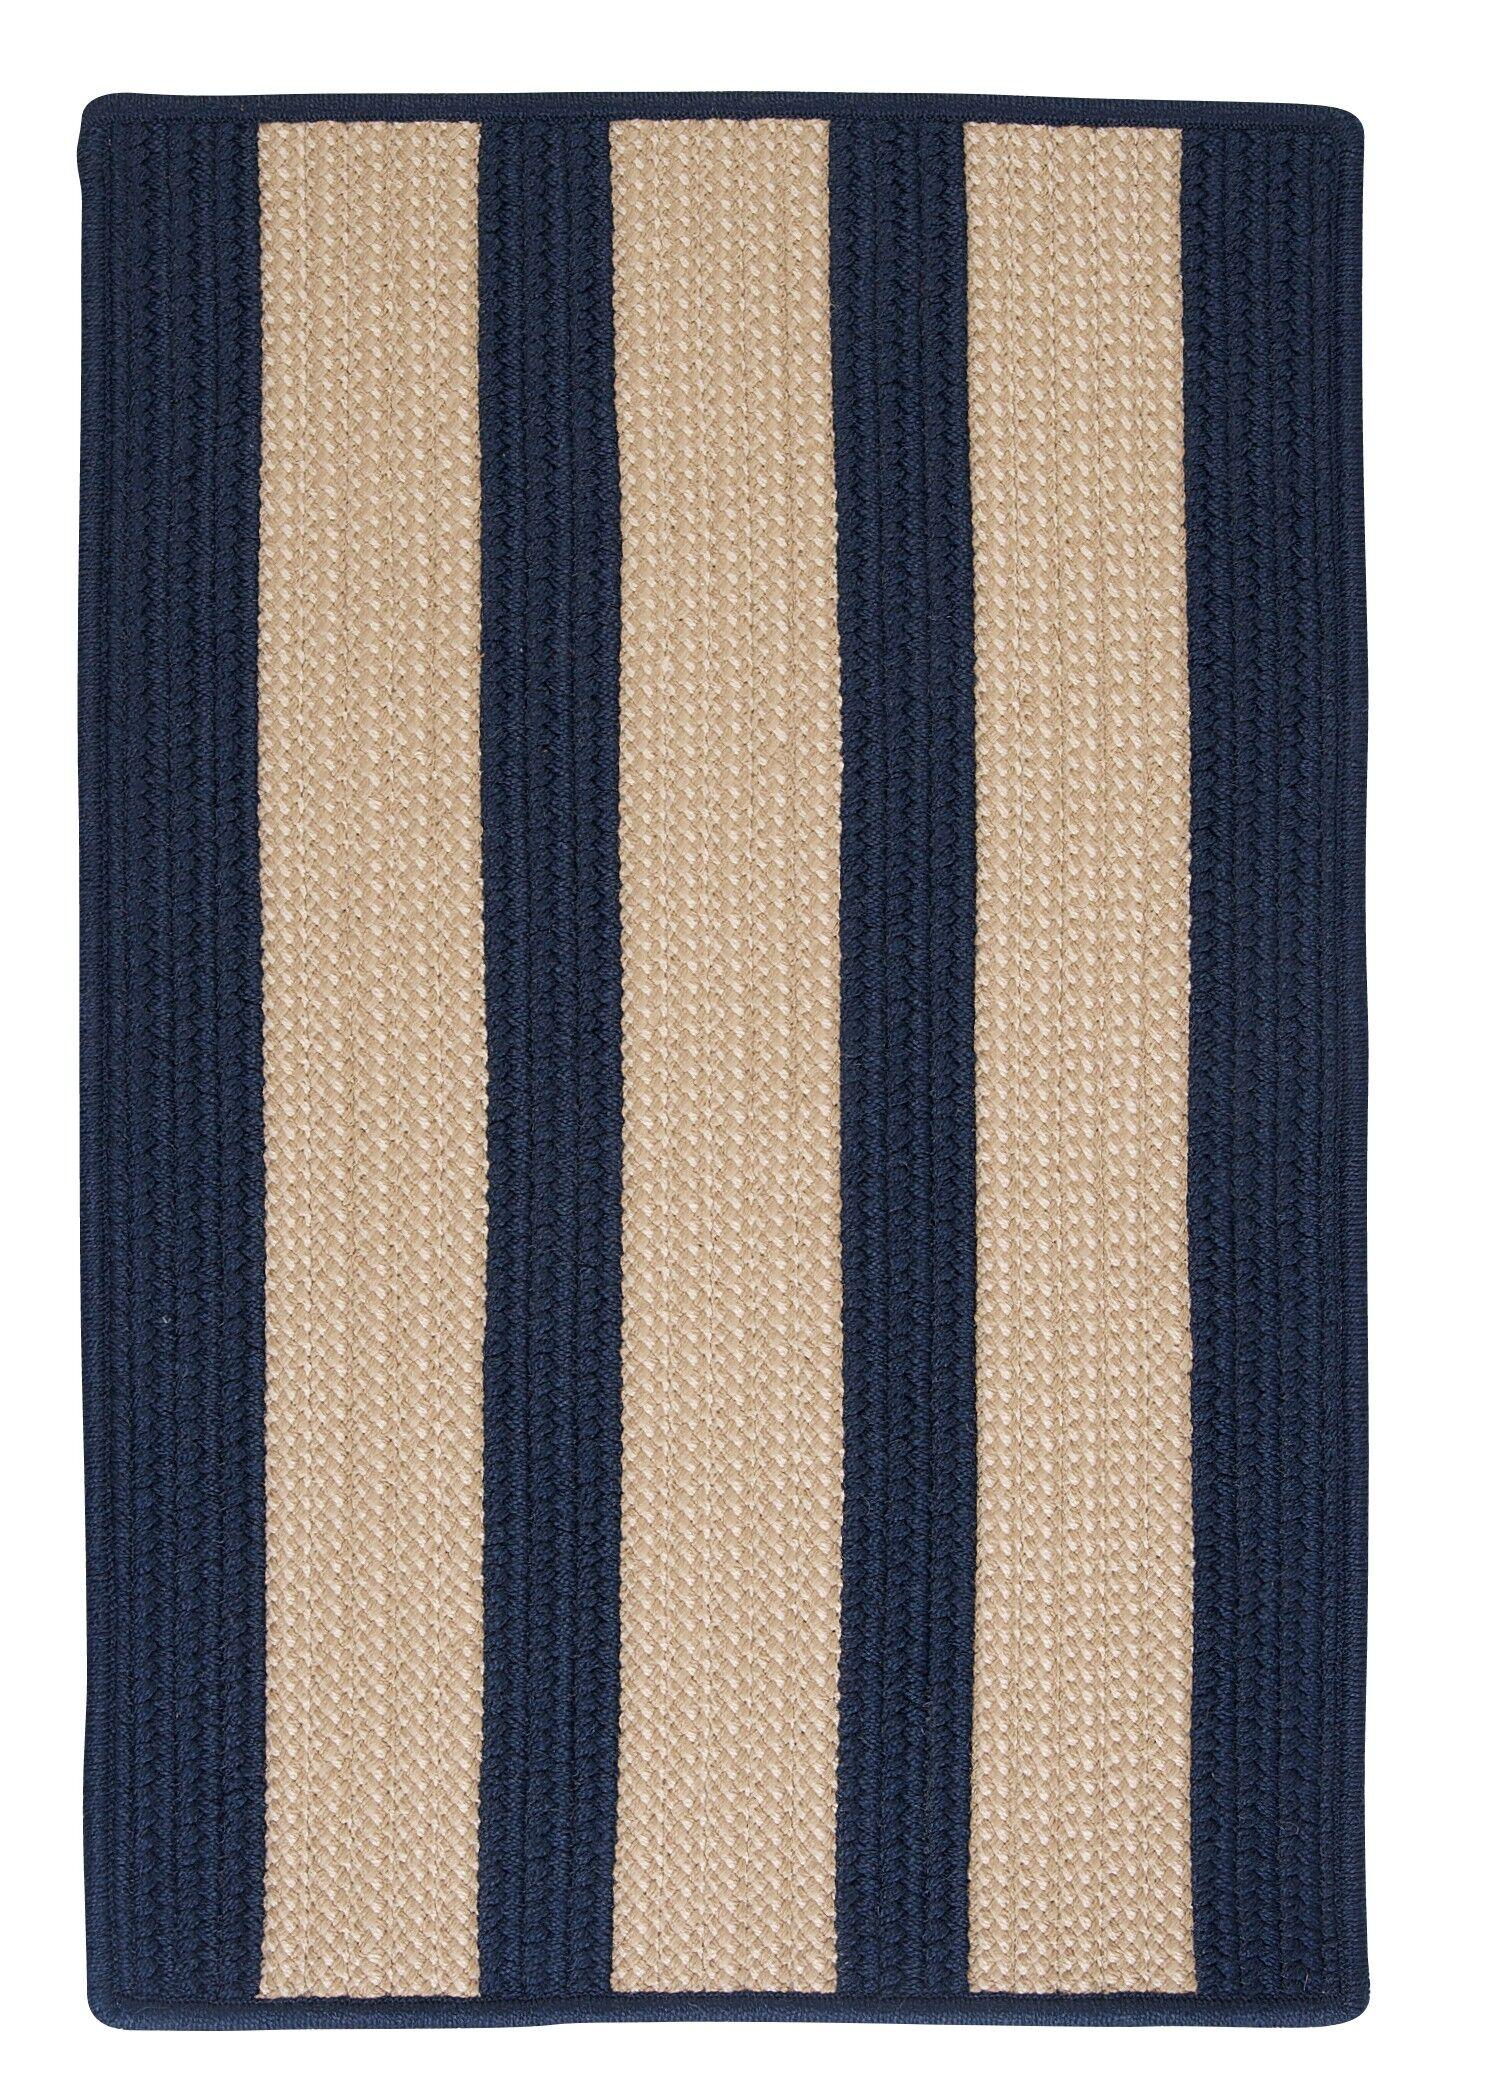 Seal Harbor Navy Indoor/Outdoor Area Rug Rug Size: Rectangle 10' x 13'